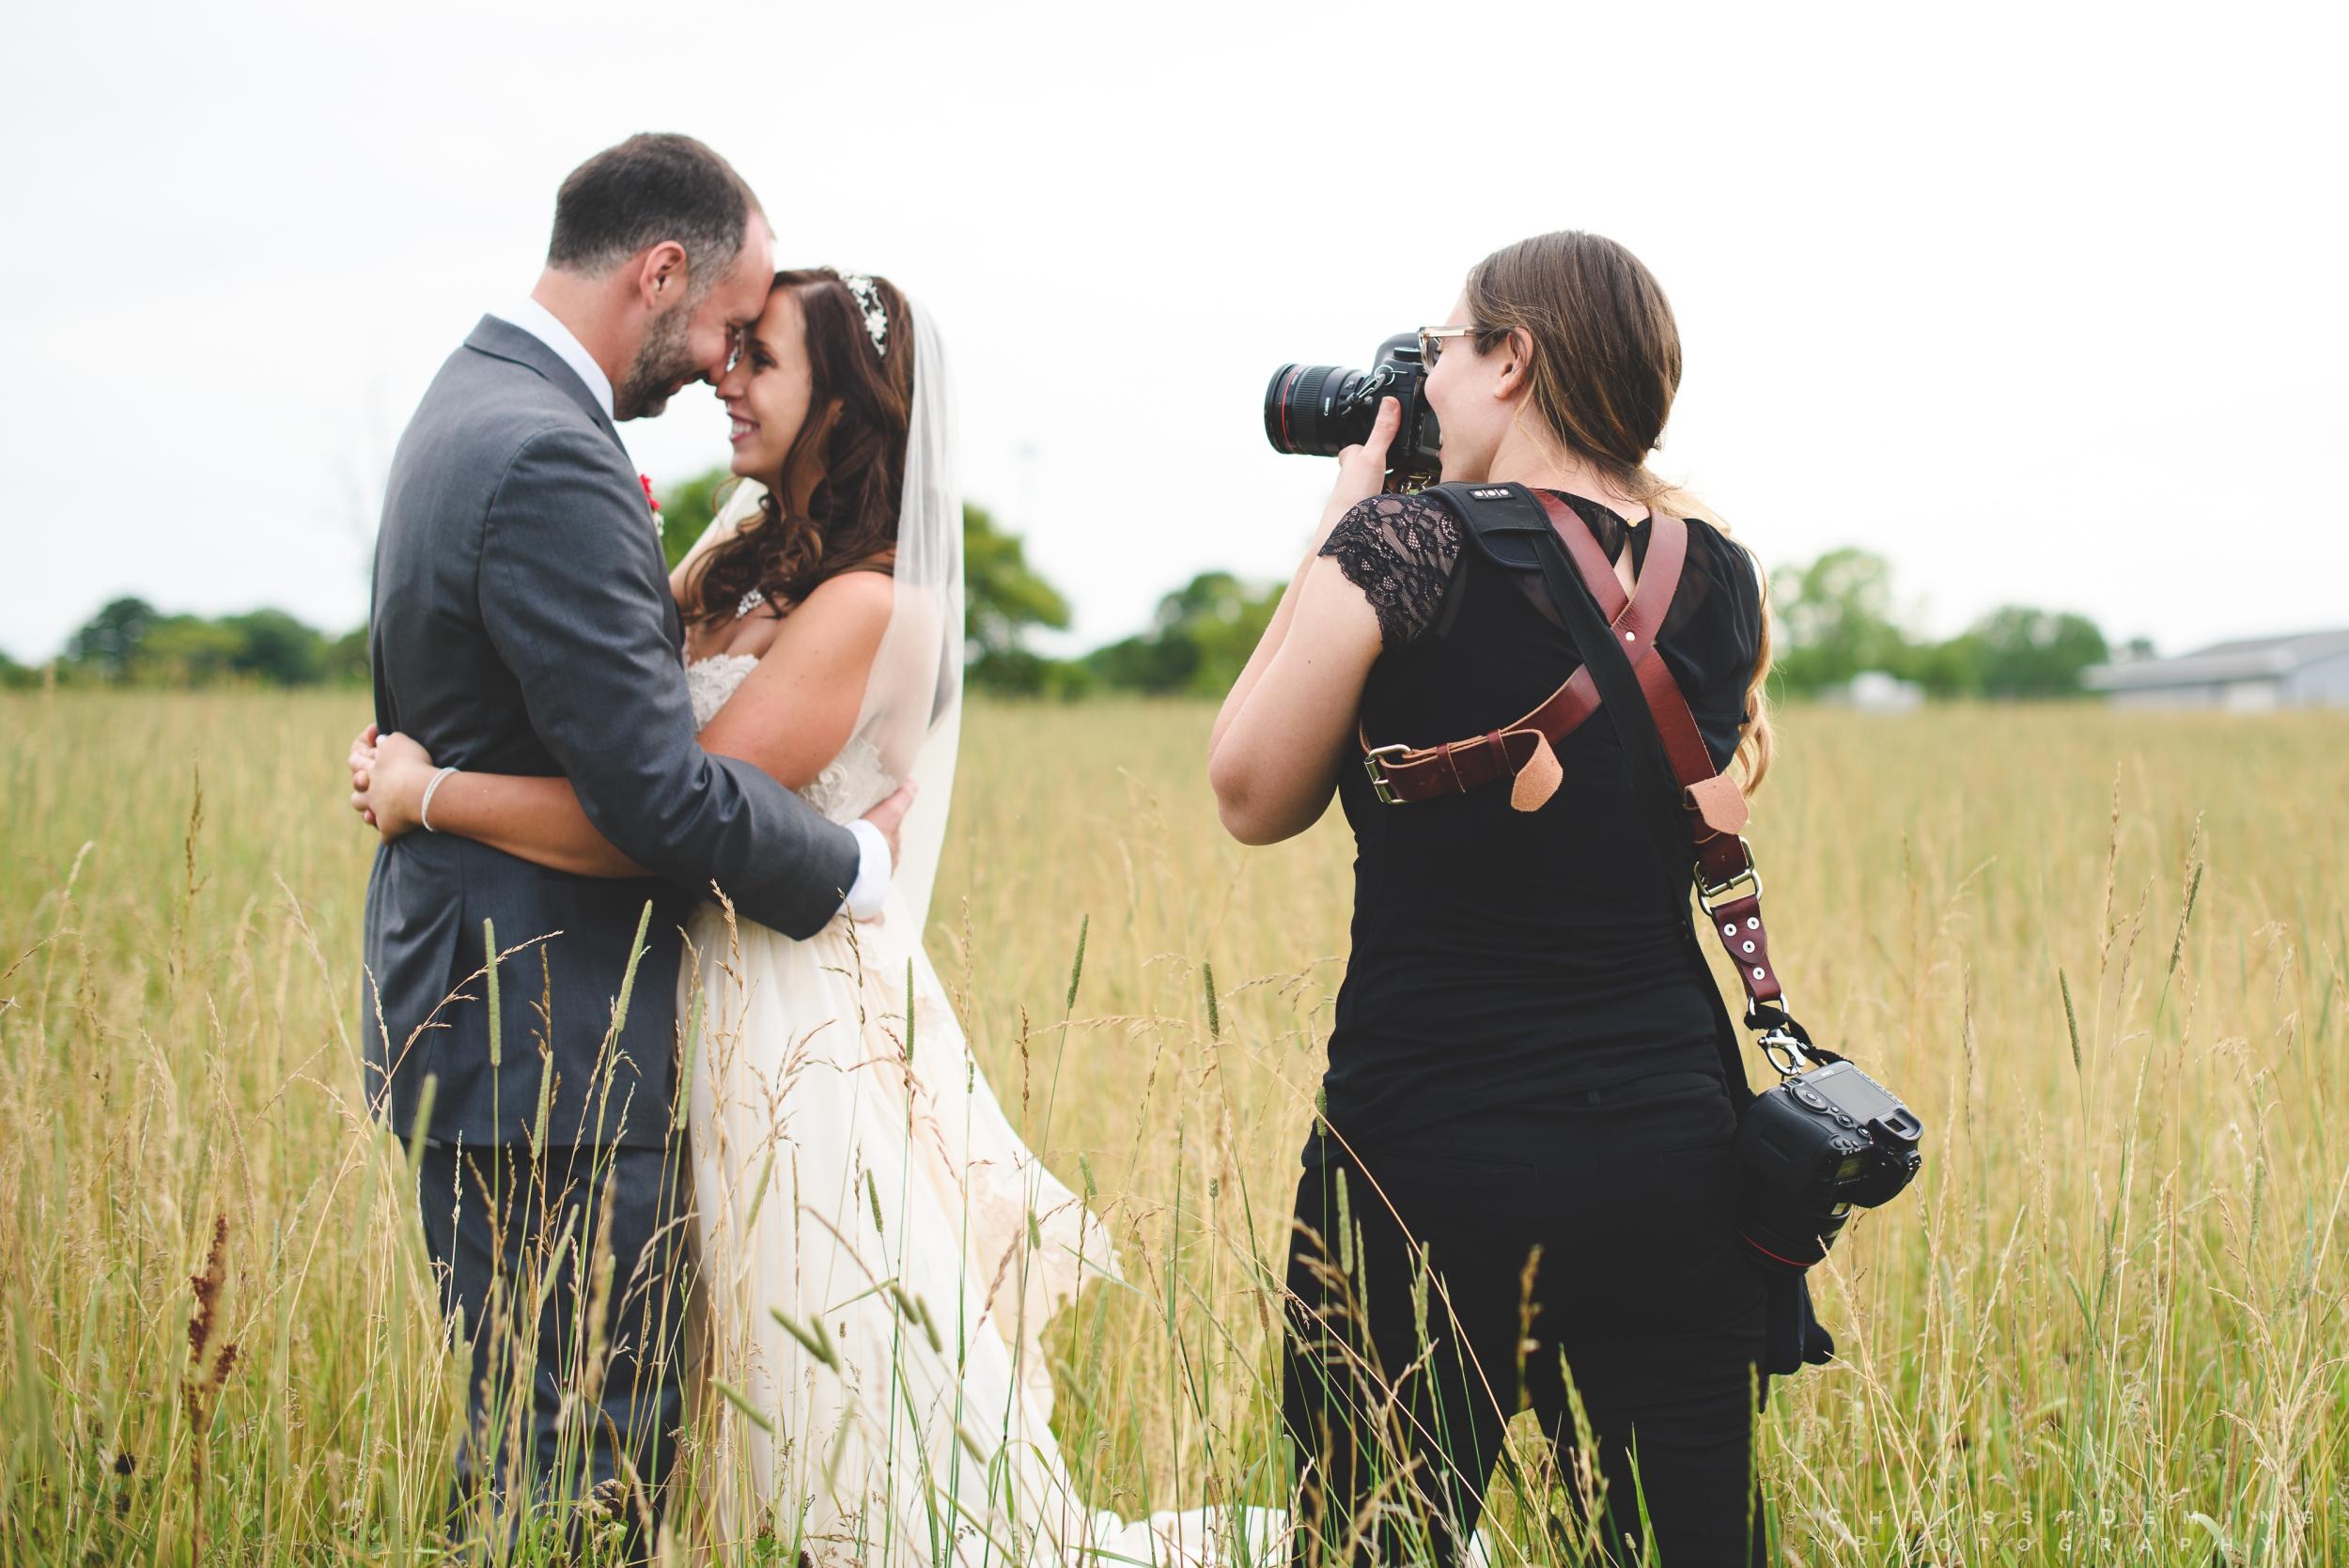 crete_IL_farm_wedding_photographer_0068.jpg